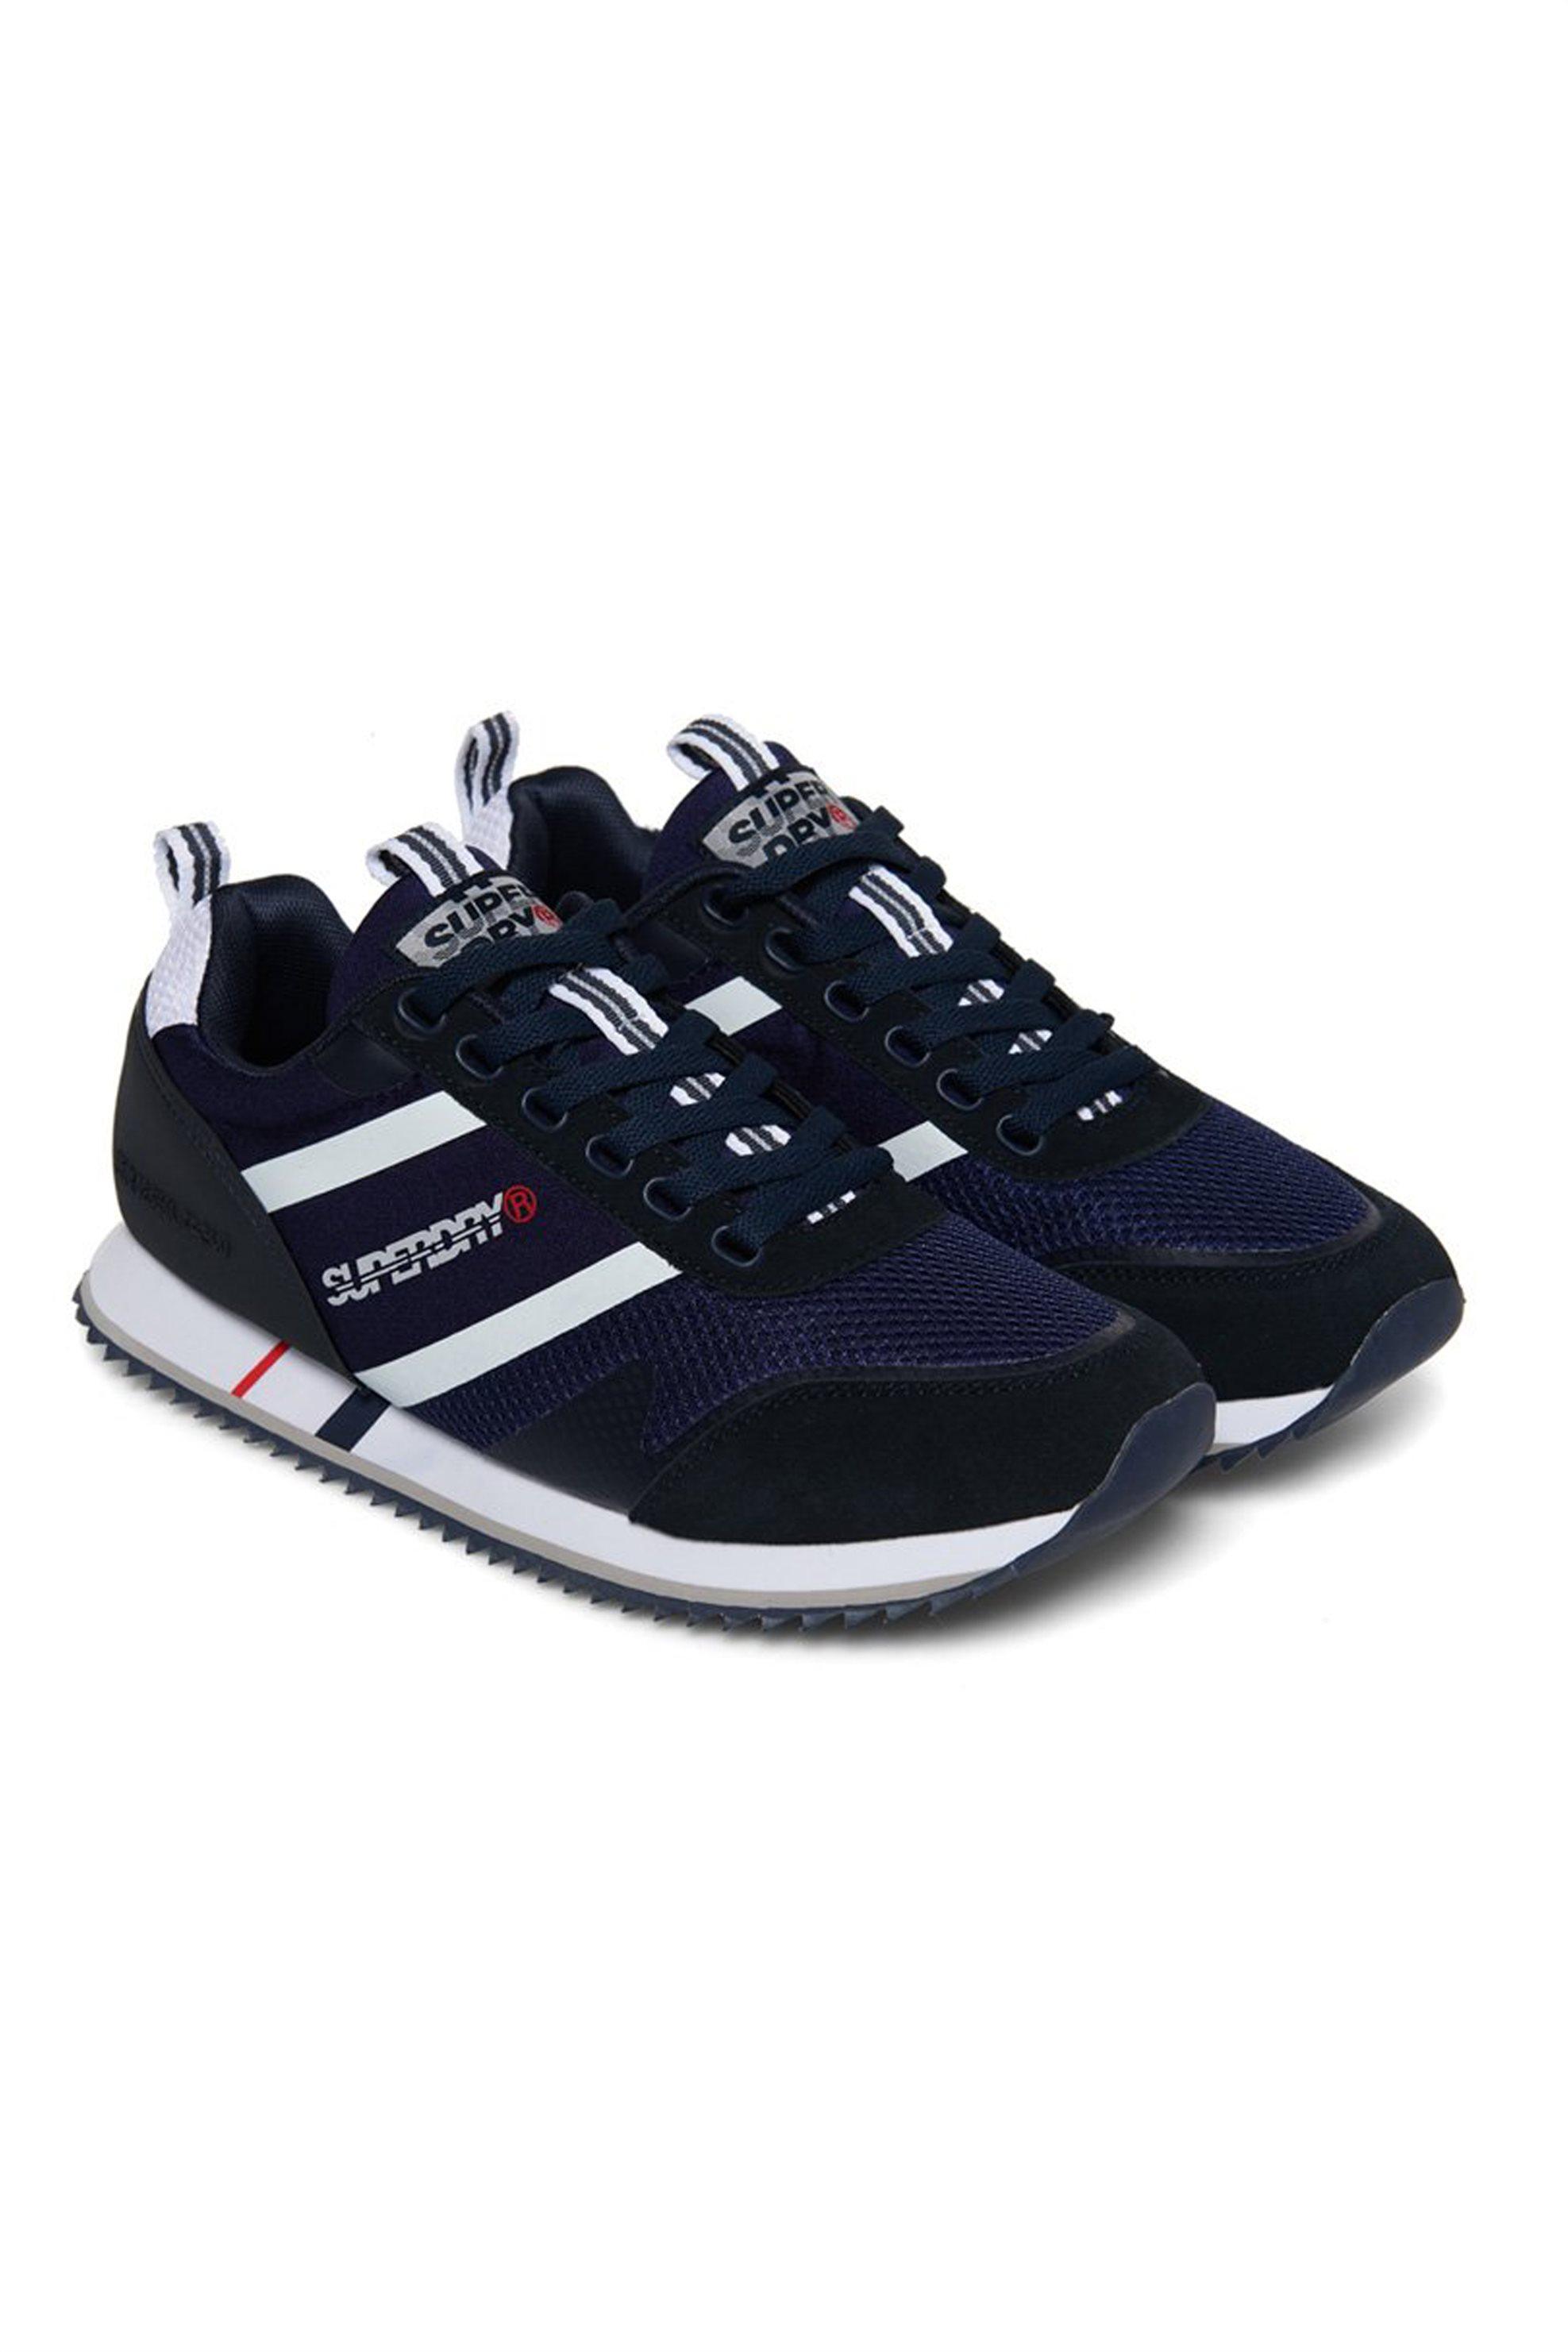 "Superdry ανδρικά sneakers με κορδόνια "" Fero "" – MF100005A – Μπλε Σκούρο"